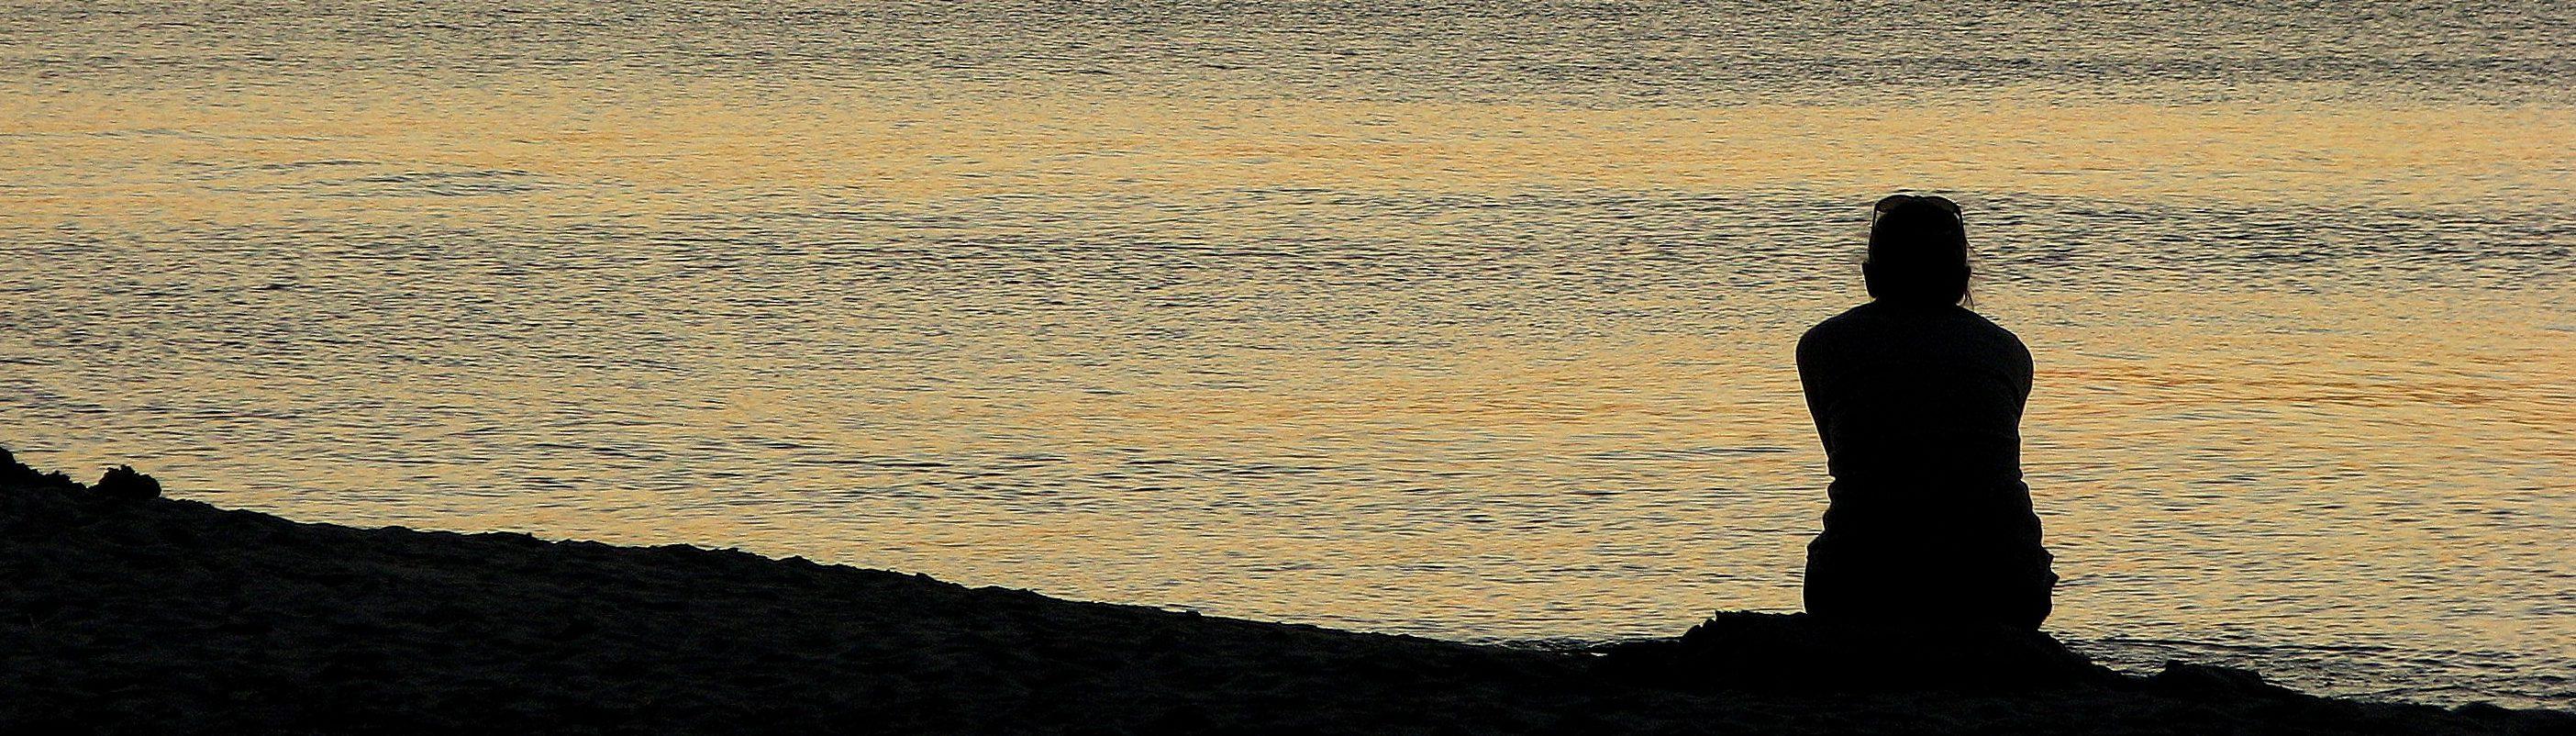 sunset-1342101